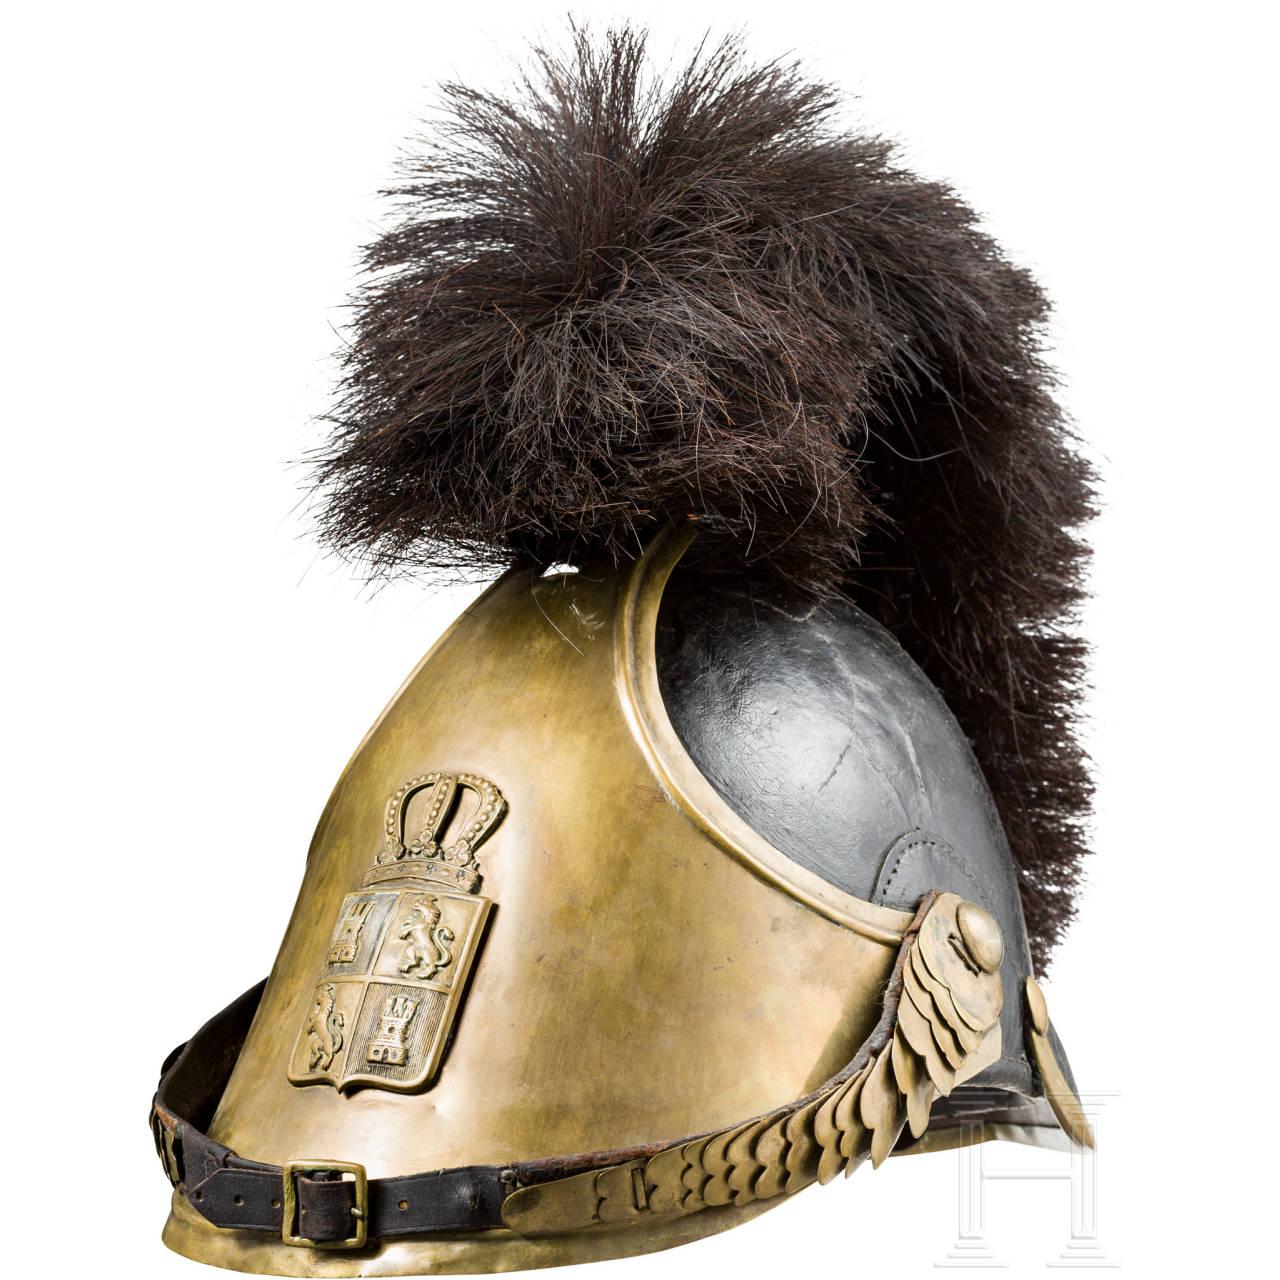 Crest helmet, circa 1860